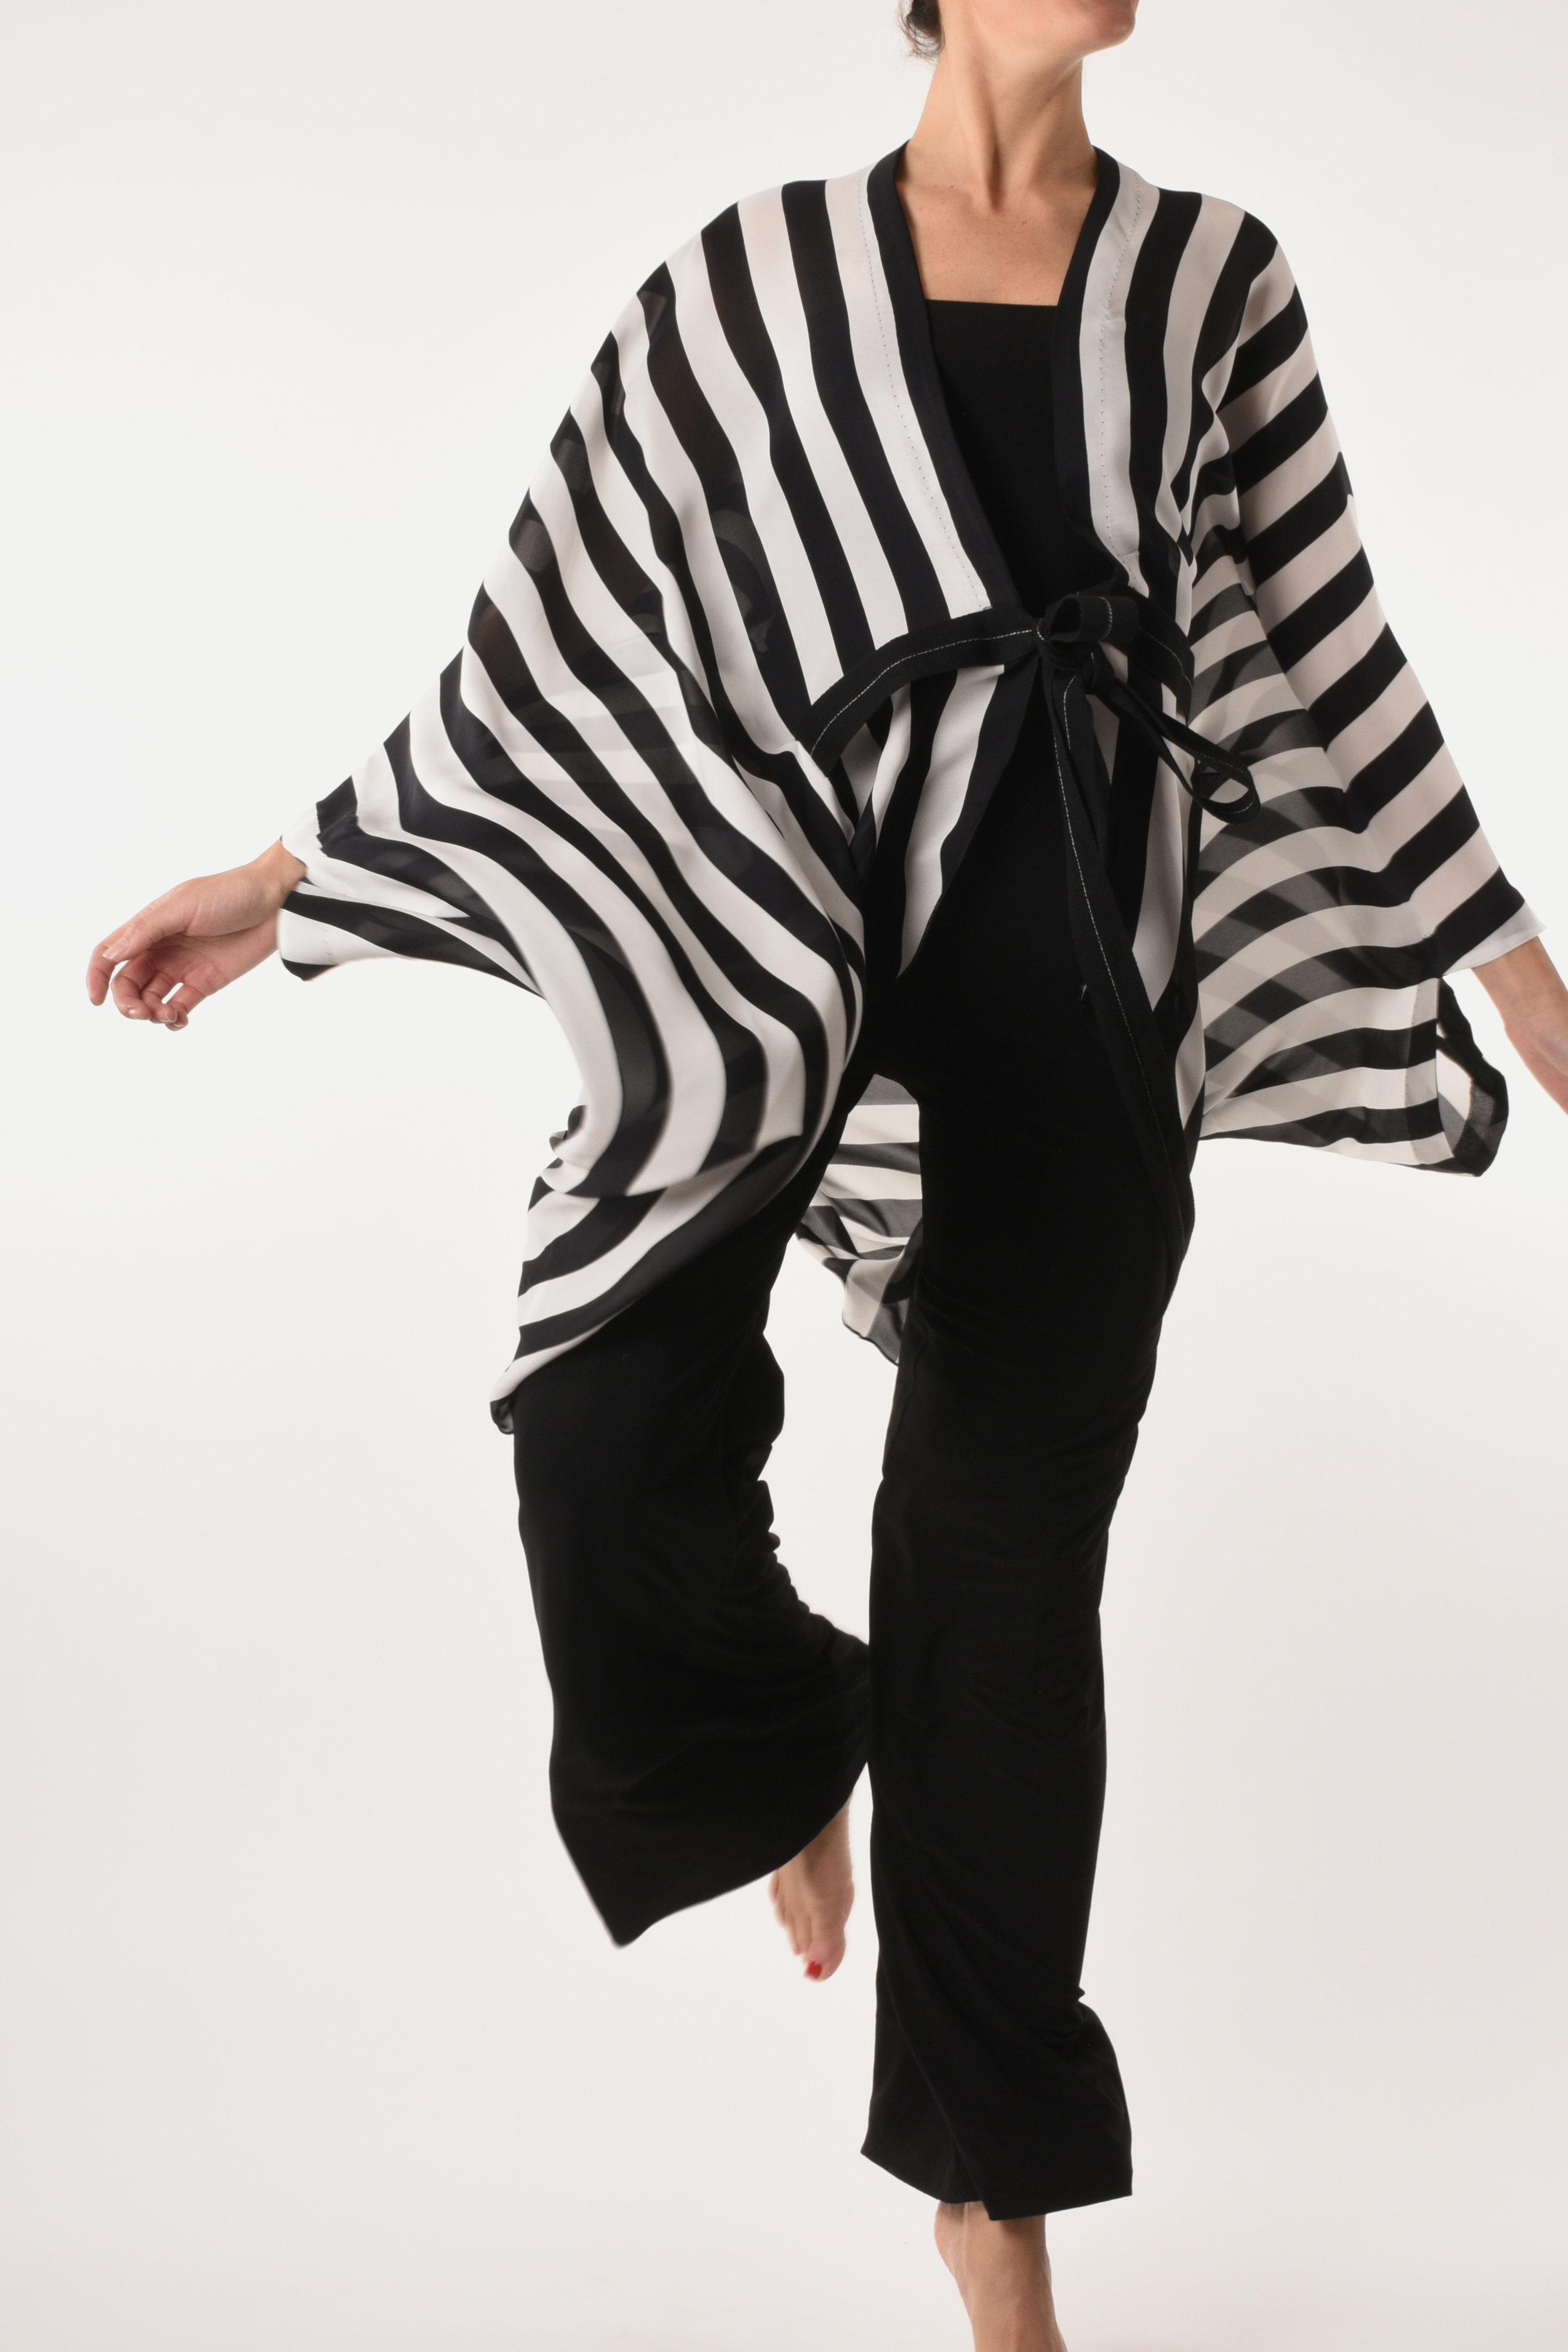 VENICE BLACK & WHITE $345 -